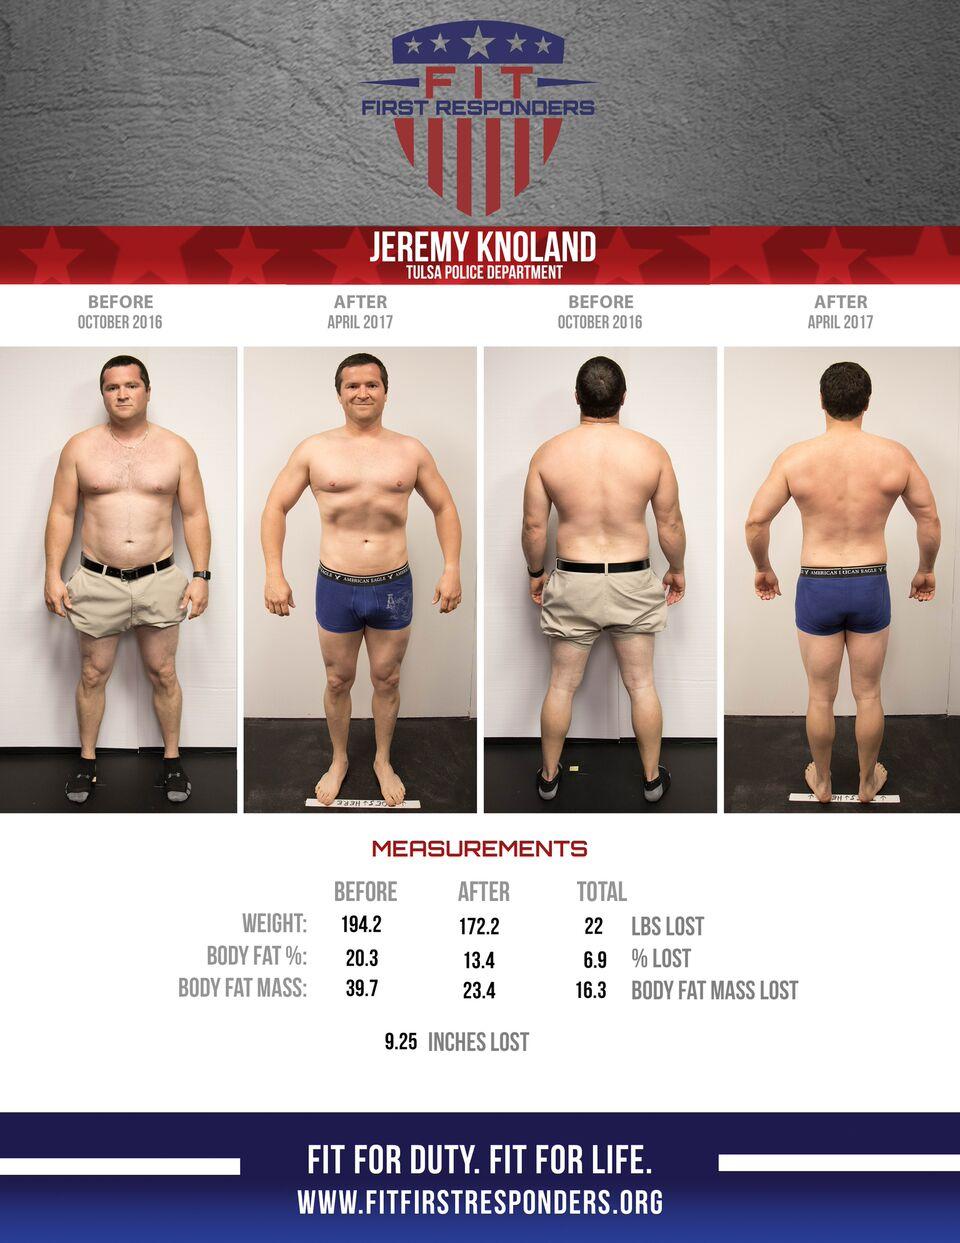 Jeremy Knoland found FFR gave him the time focus on himself!